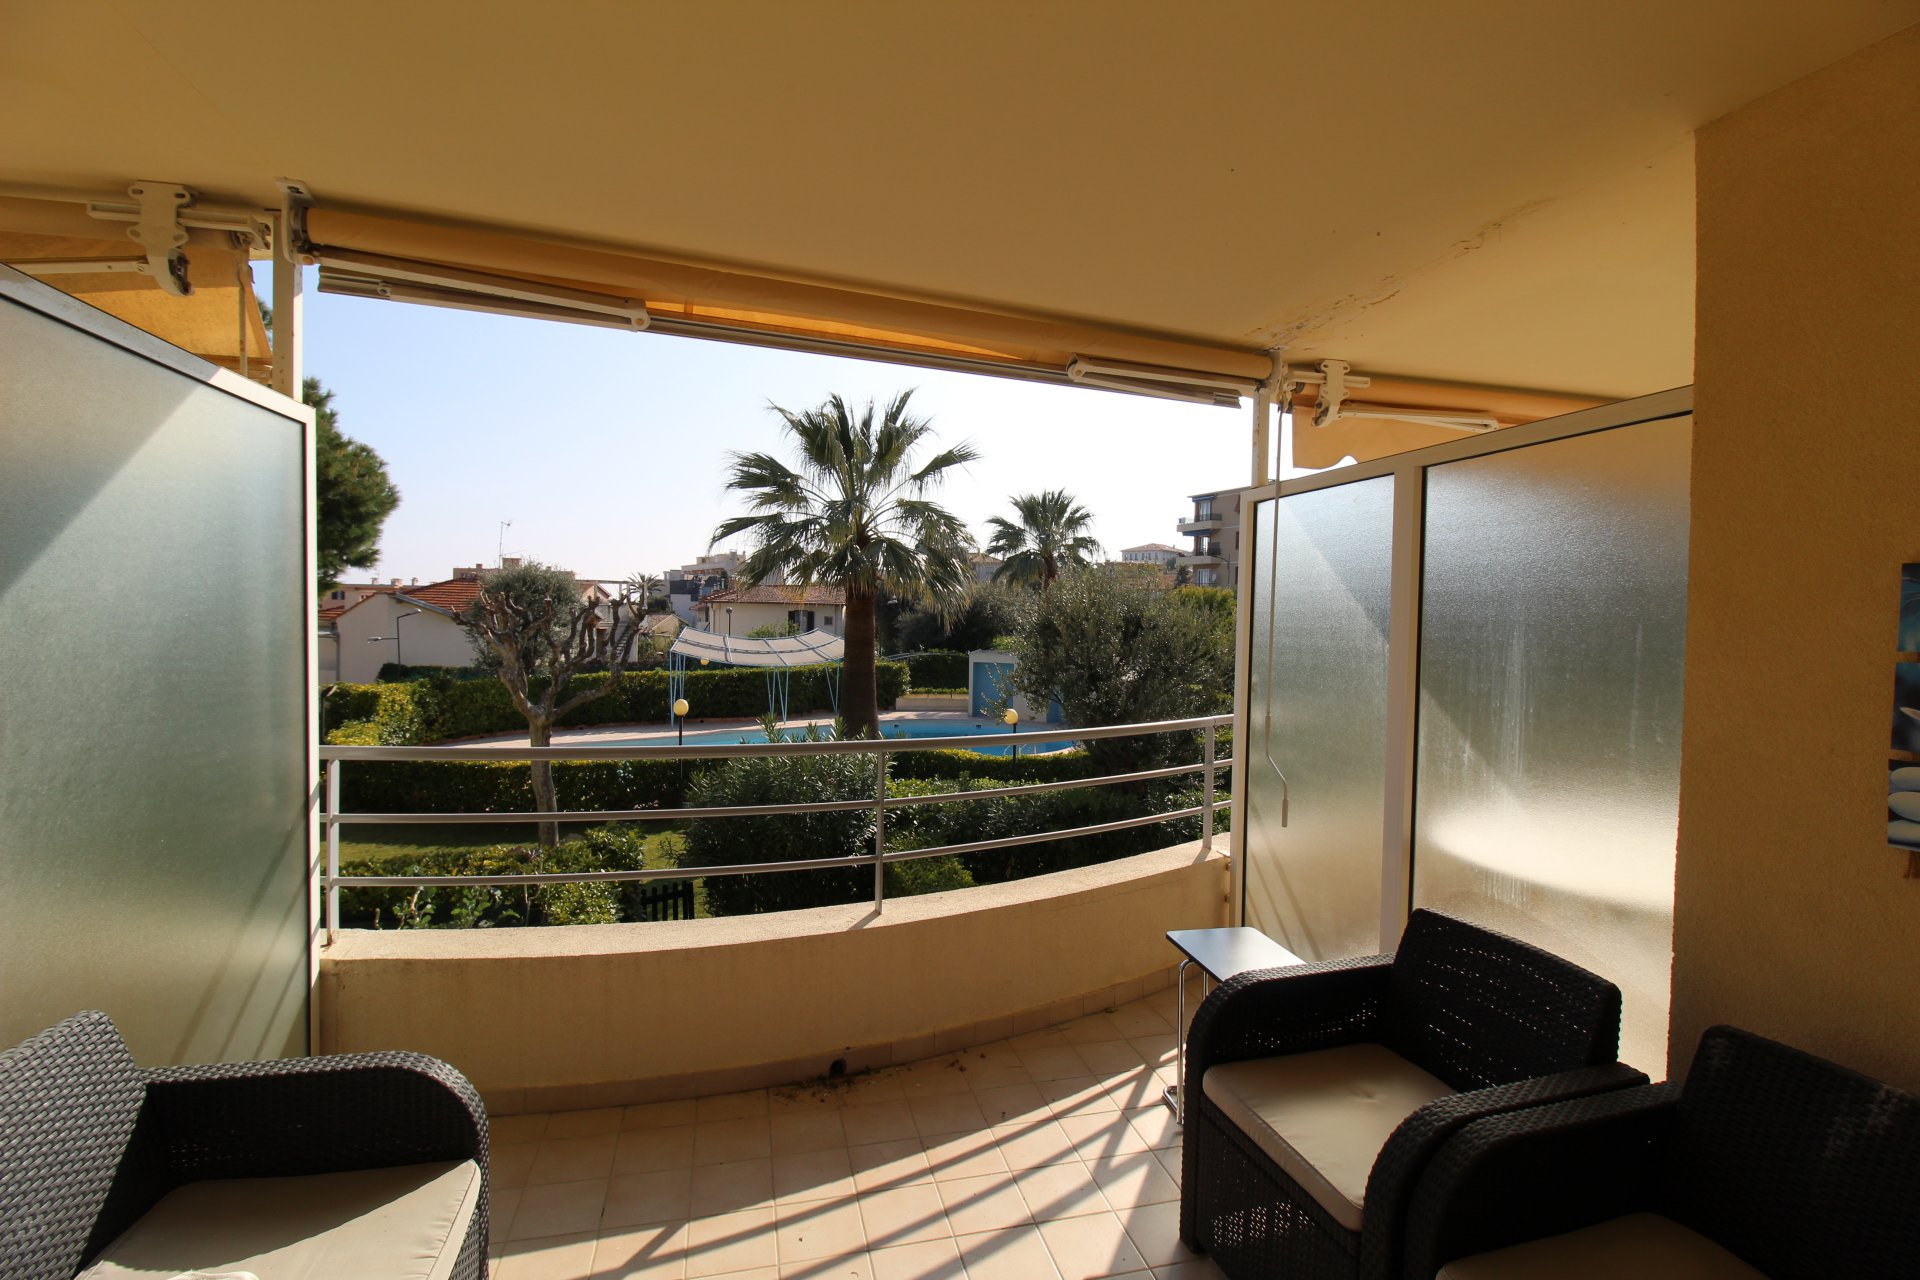 Affitto stagionale Appartamento - Roquebrune-Cap-Martin